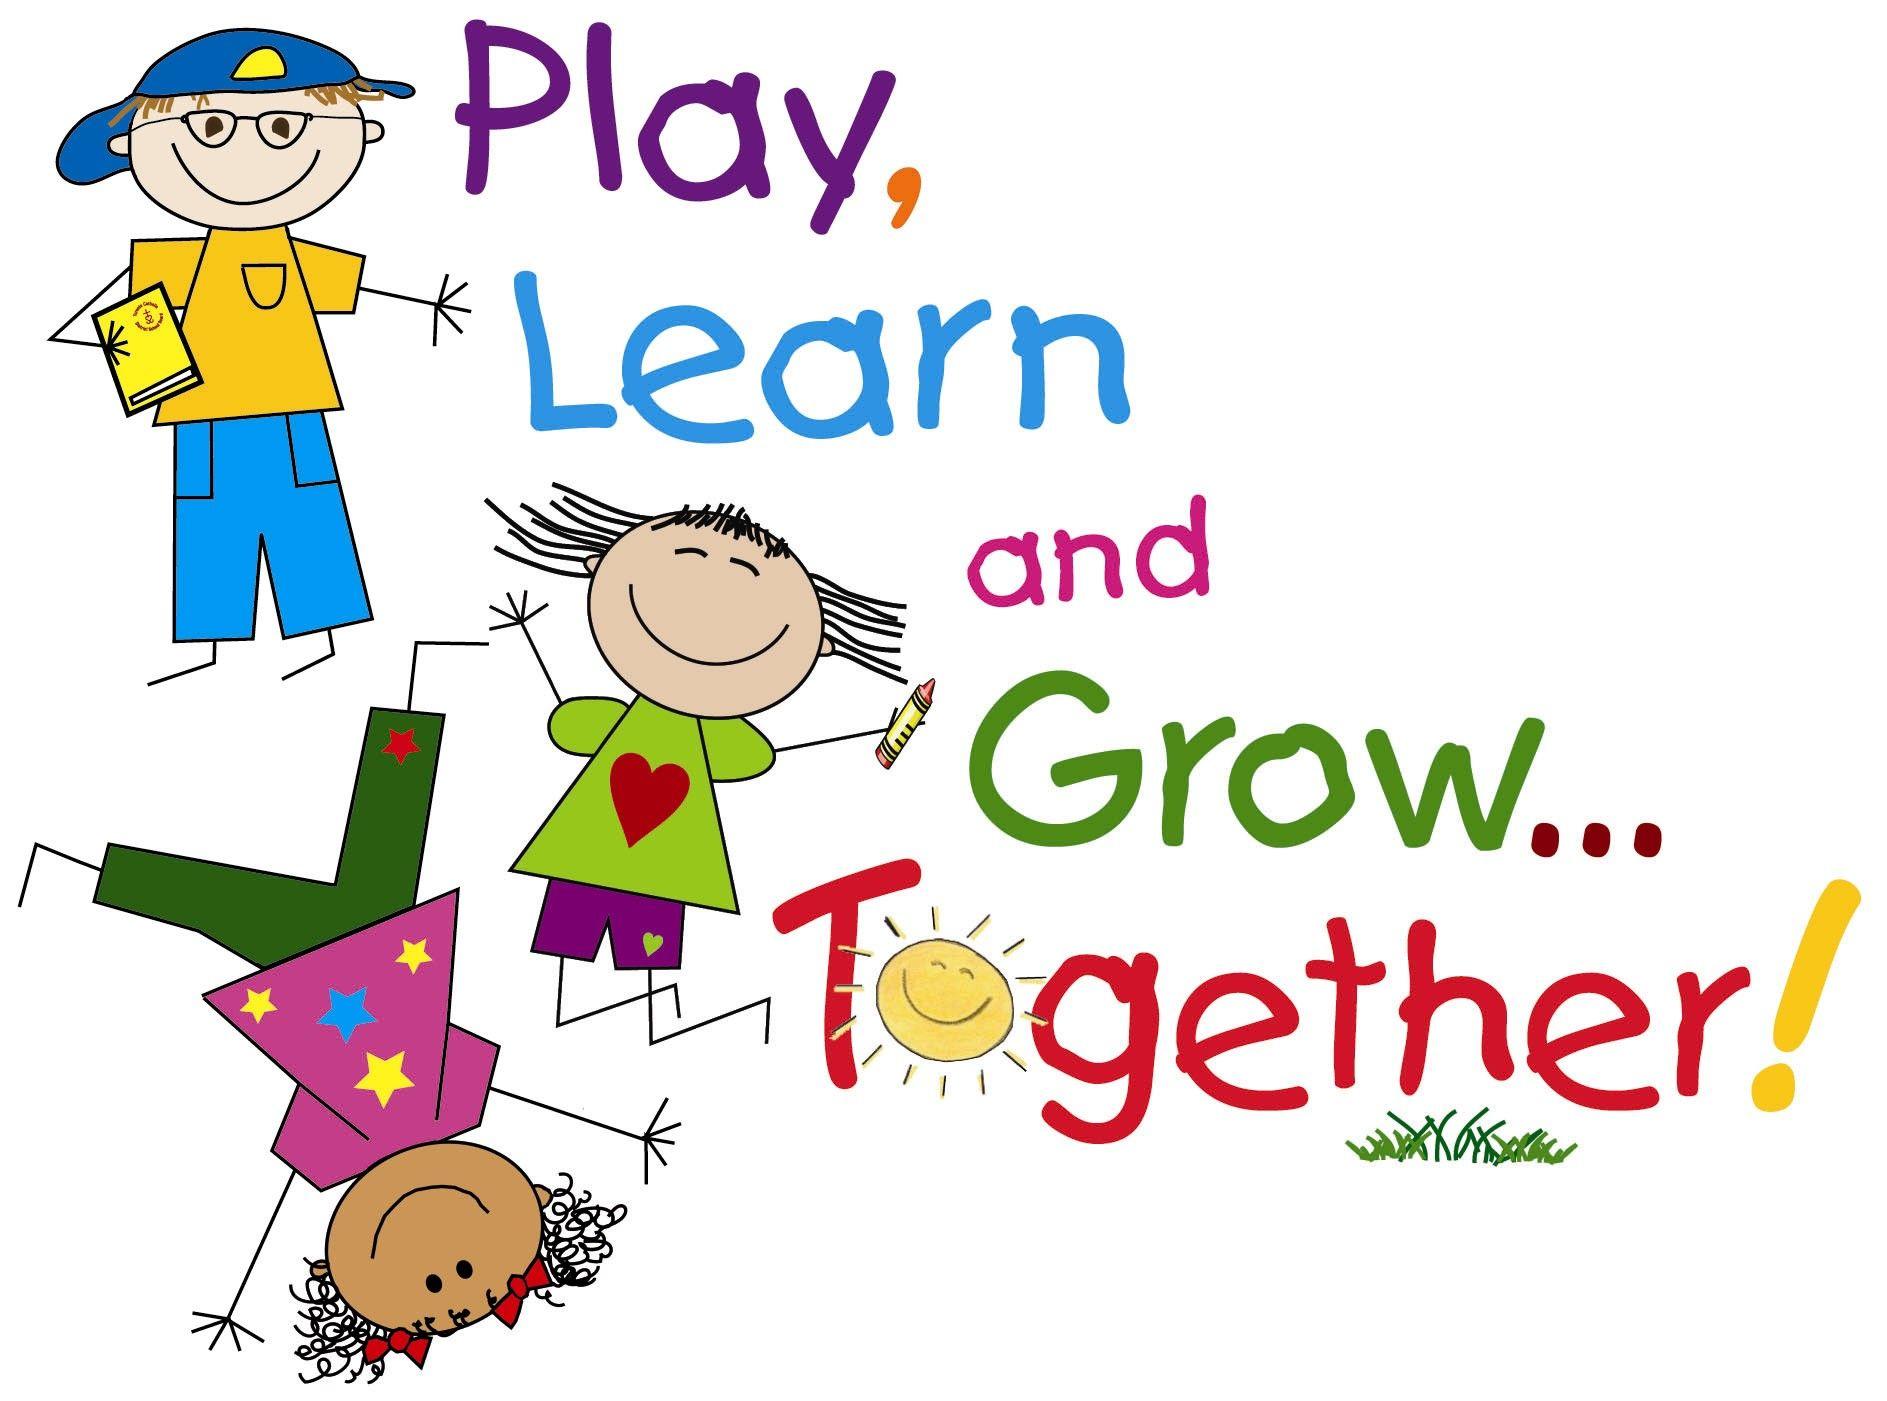 Pin by Brenda Schneider on Cute logos Preschool lesson plans 1887x1401